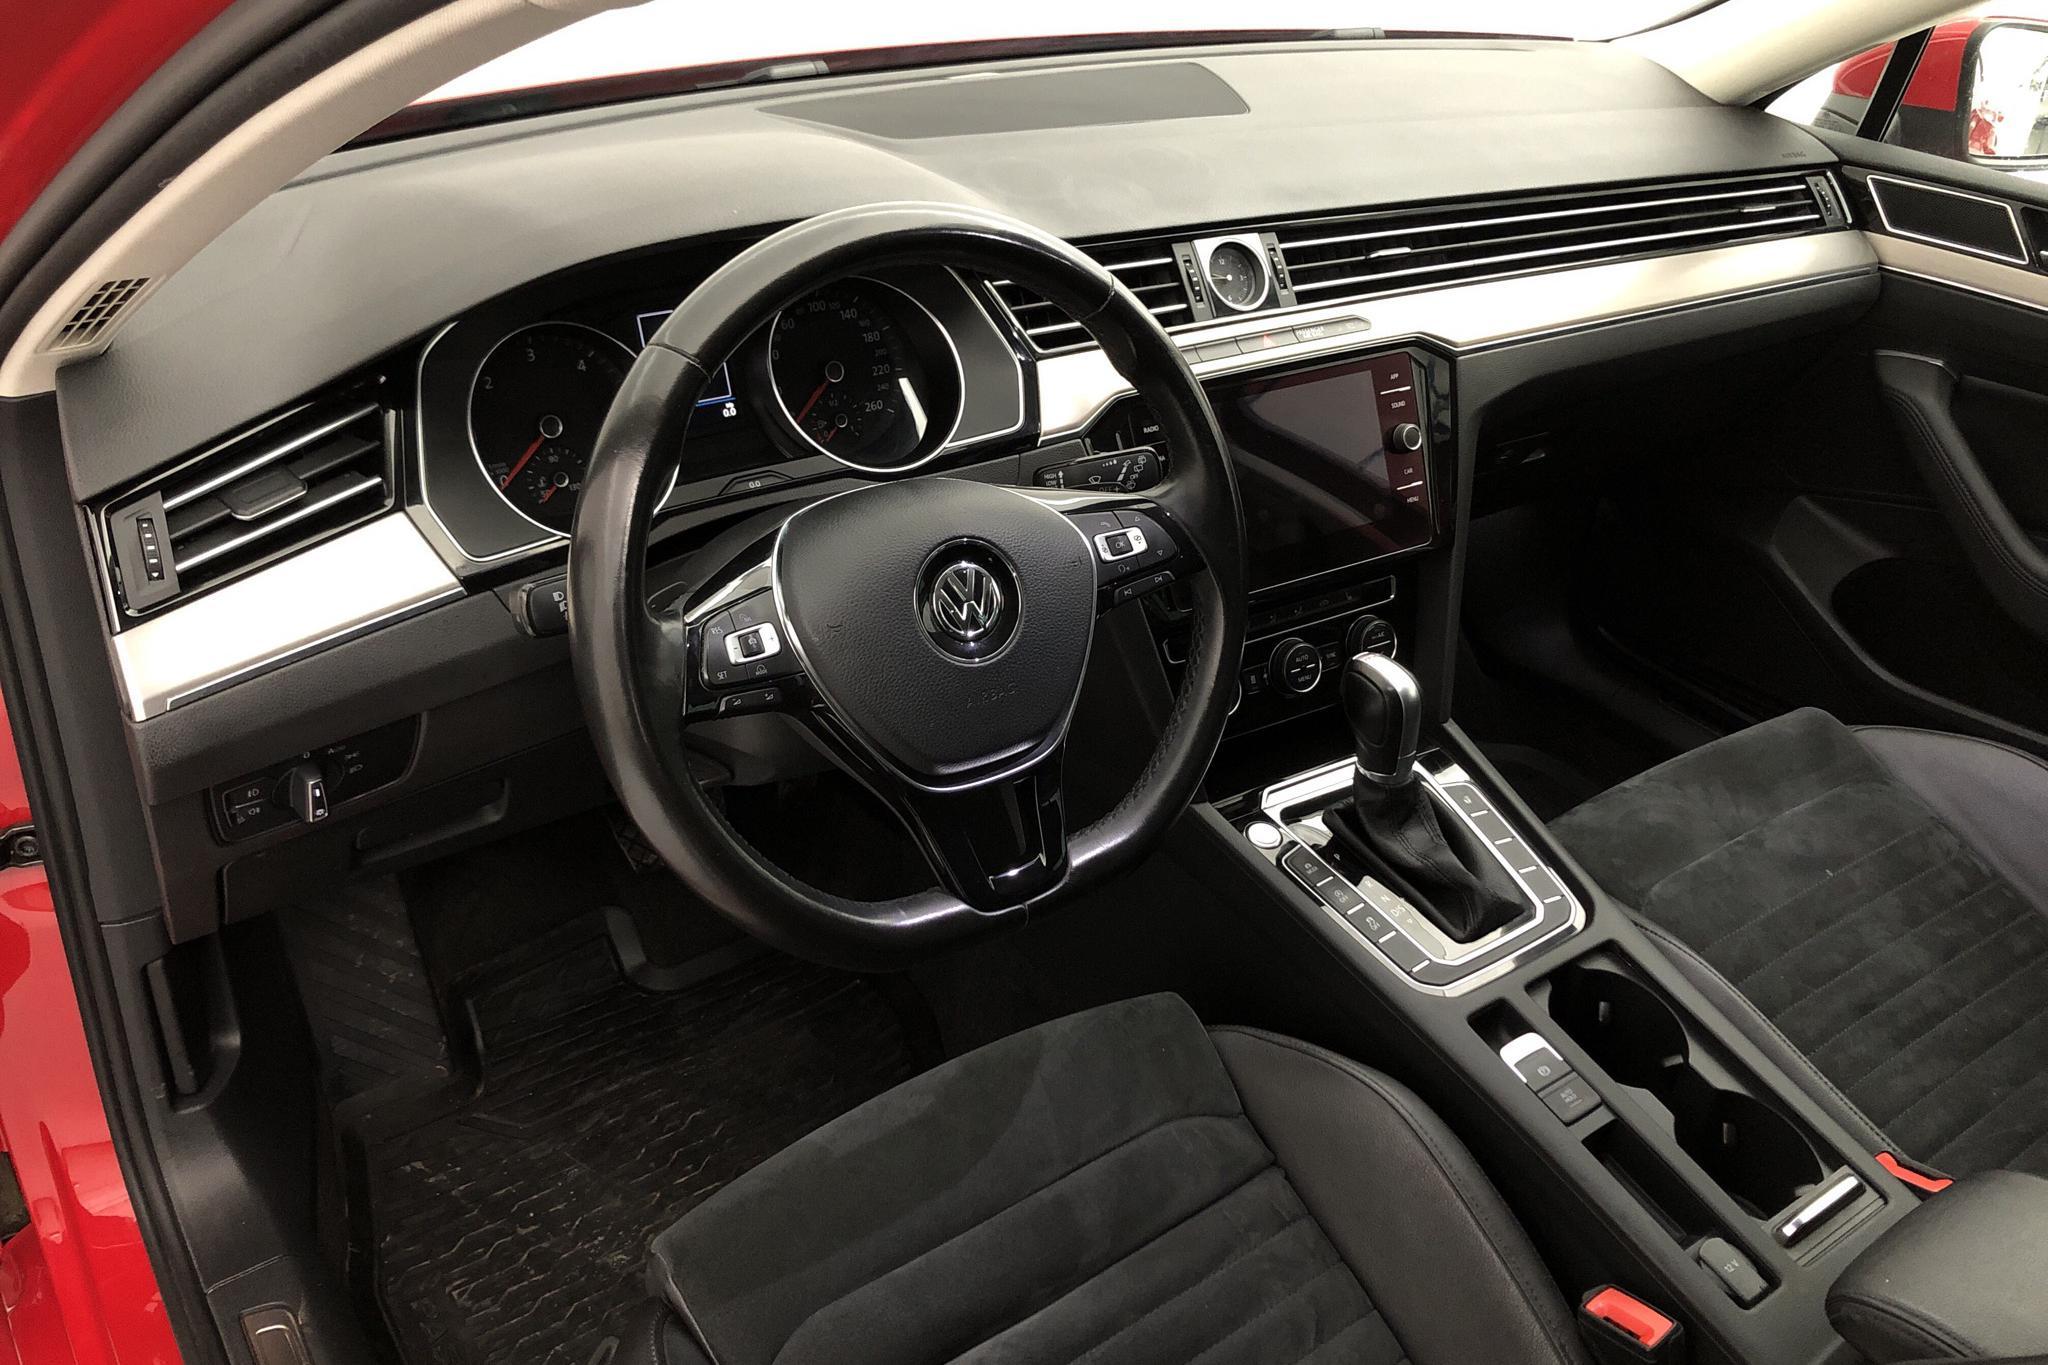 VW Passat 2.0 TDI Sportscombi (190hk) - 11 697 mil - Automat - röd - 2018